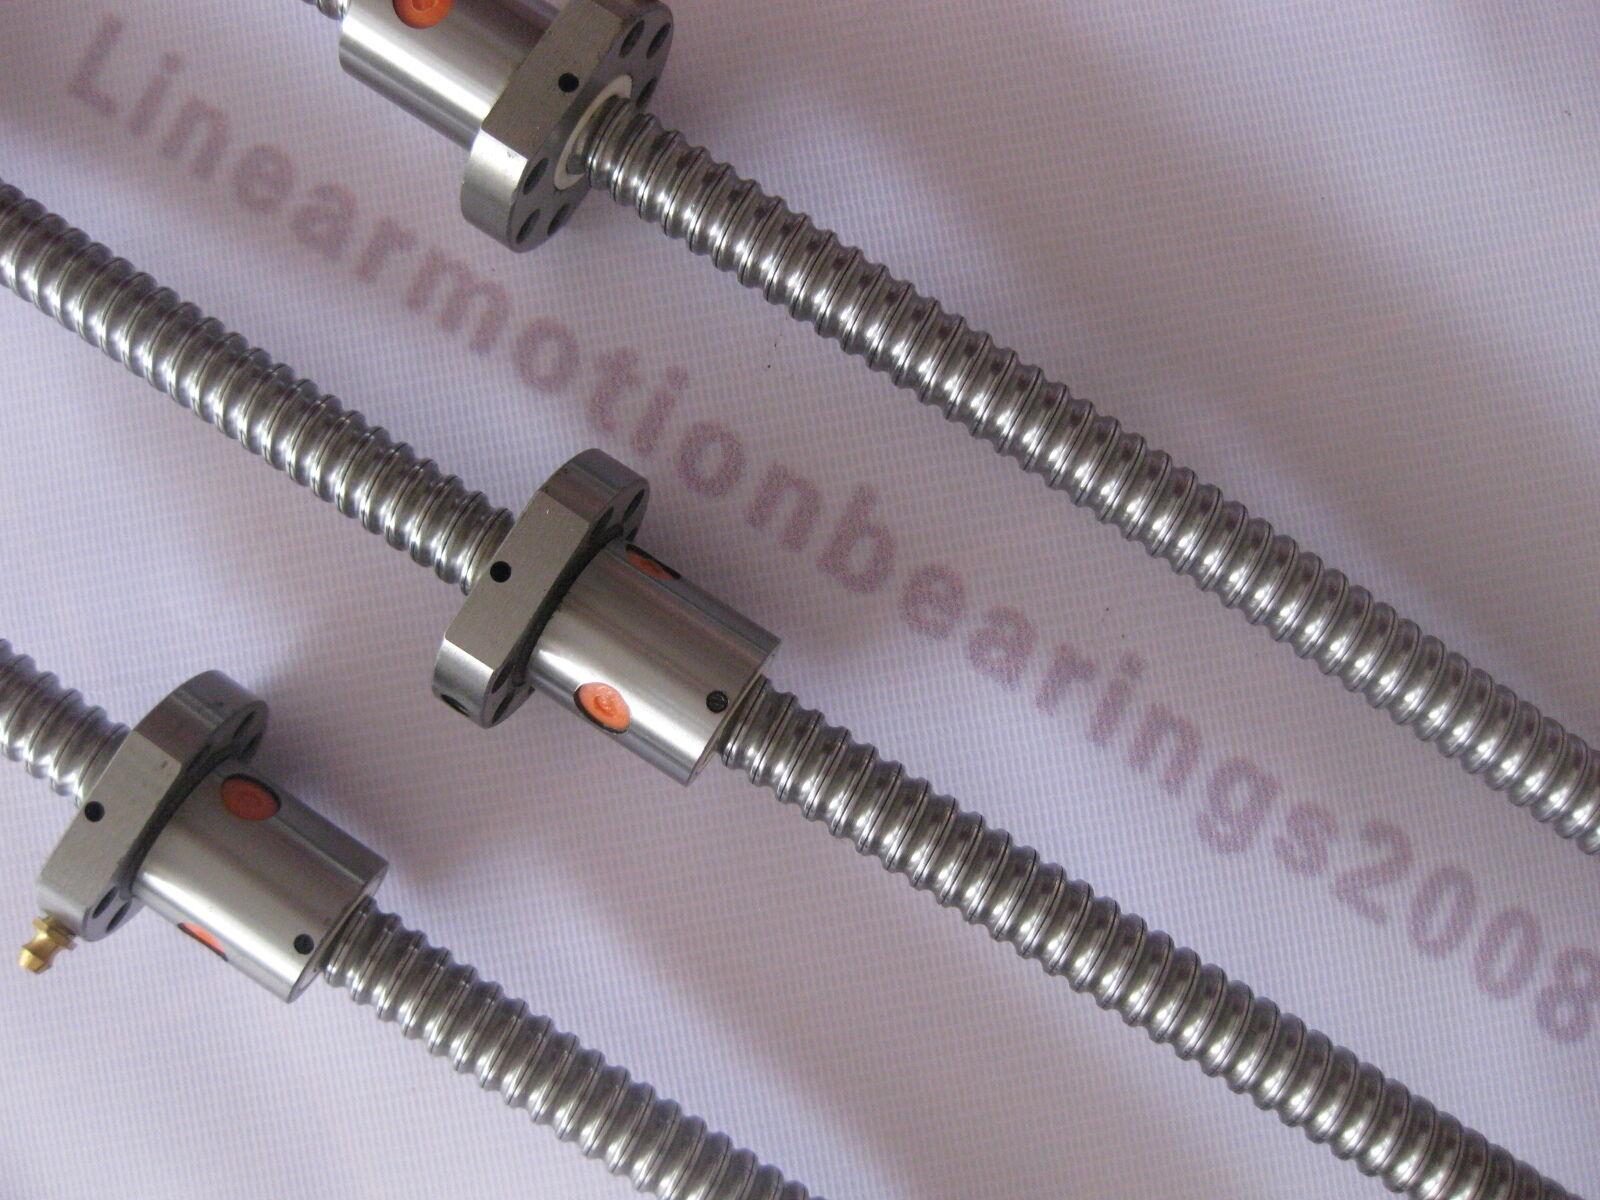 3 ANTI BACKLASH BALLSCREW RM1605-200//500//550MM-C7 BALL SCREWS BALL NUT SET CNC